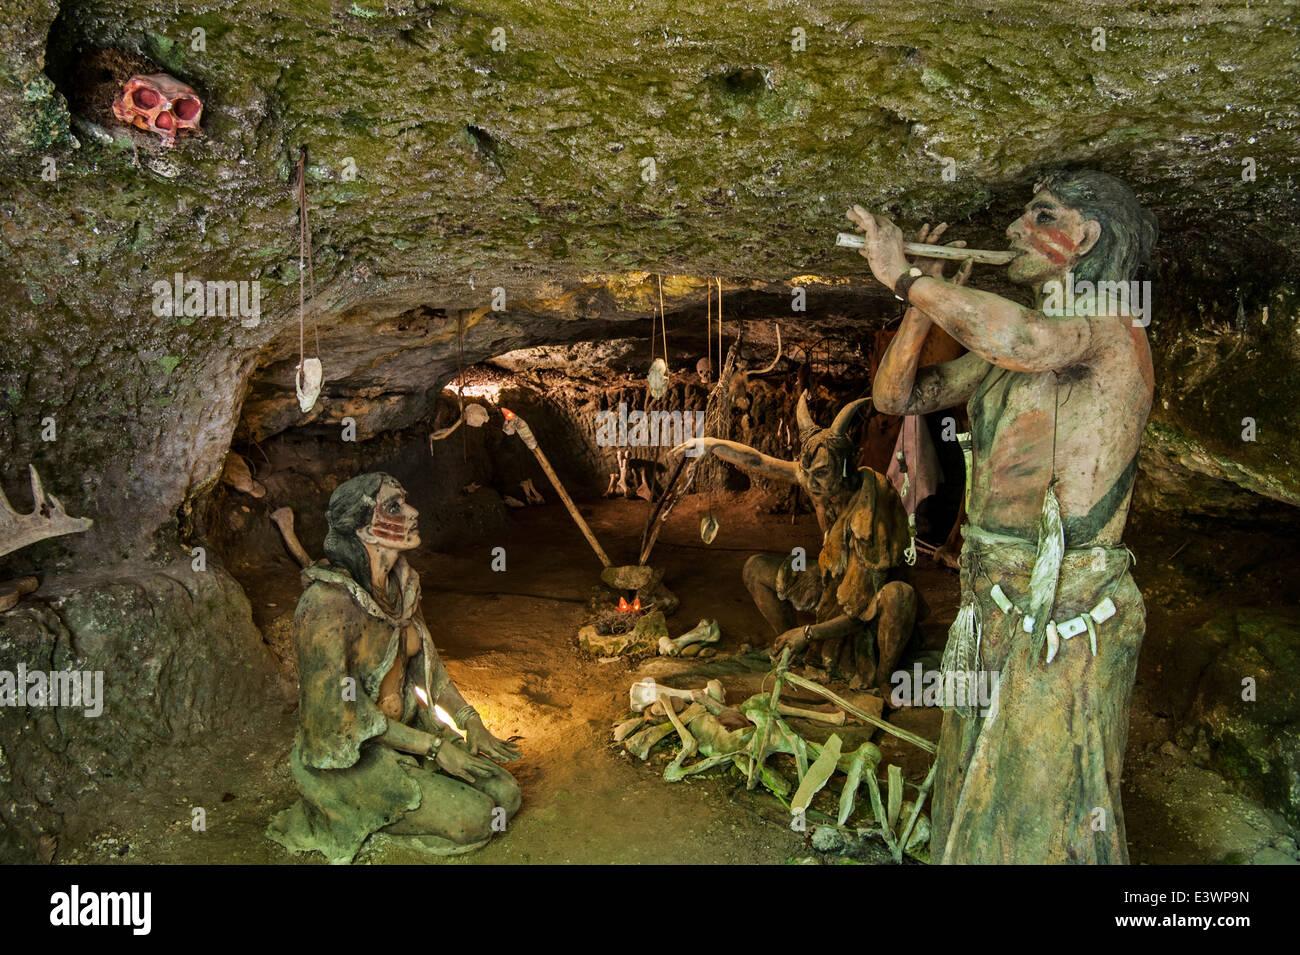 Cro Magnon Man Cave Art : Prehistoric cro magnon shamen and woman in cave at grottes